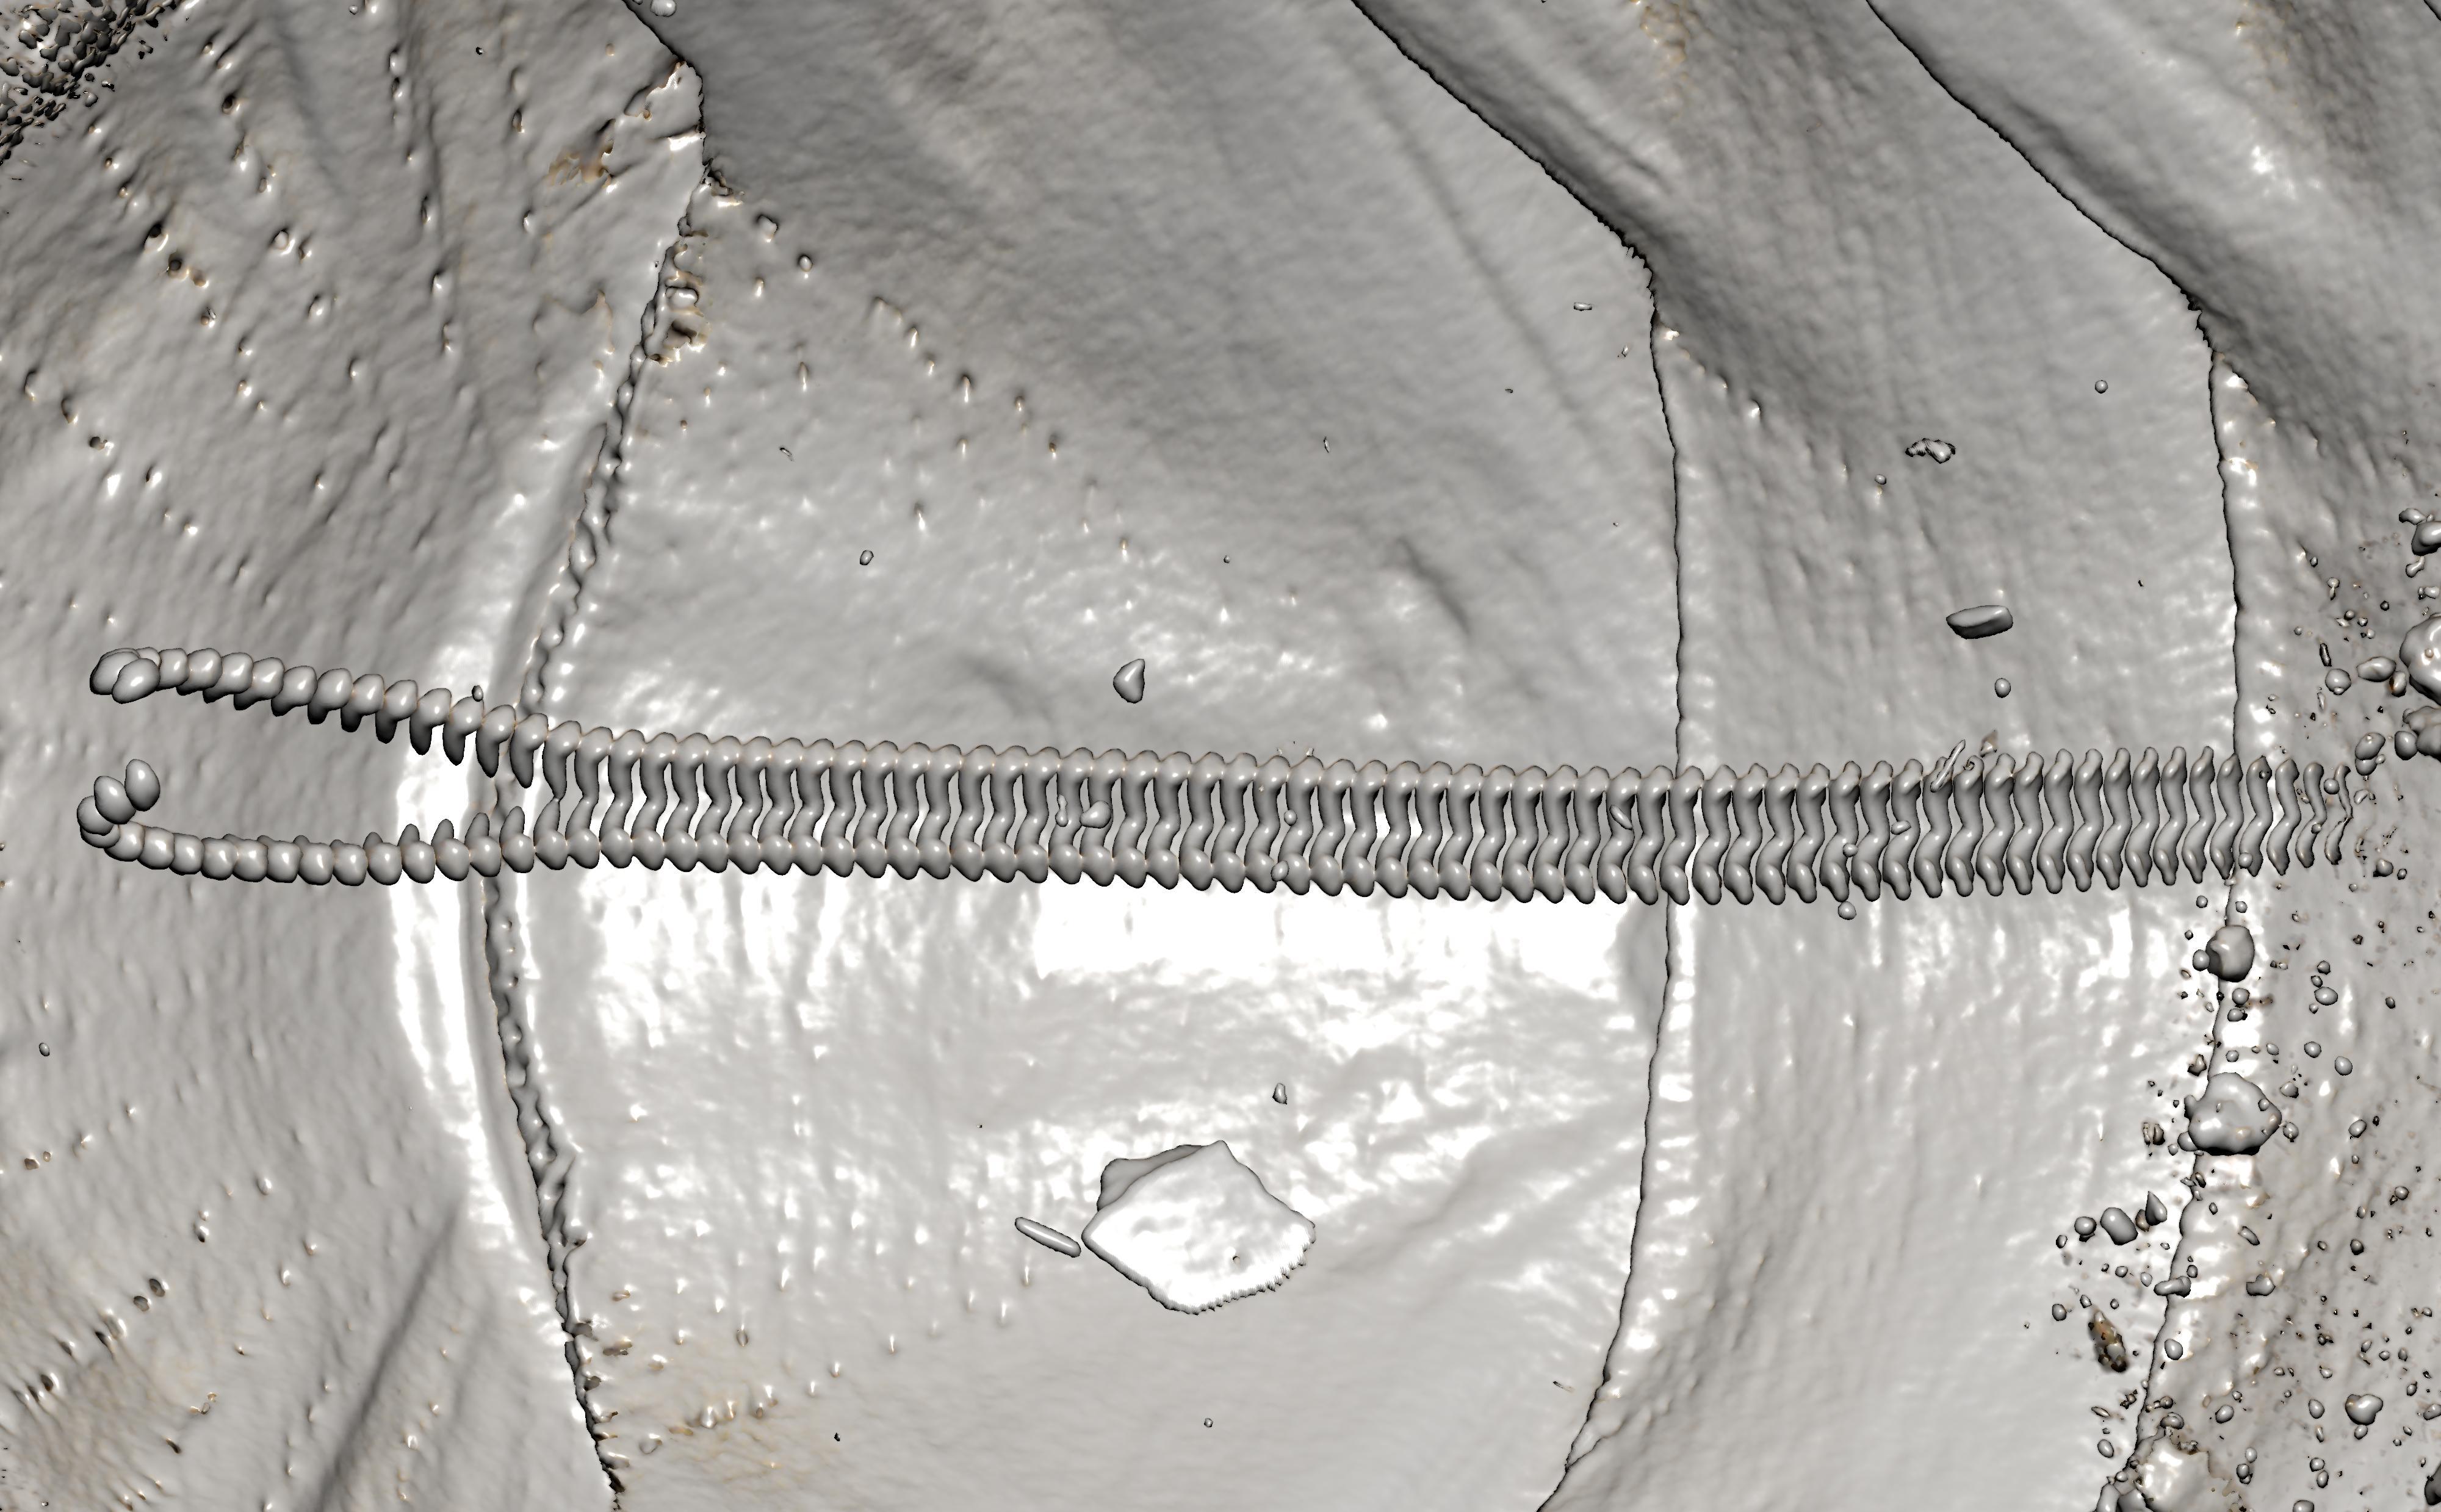 BE-RBINS-INV-TYPES-MT-3657-Ischnochiton-yemenensis-MICROCT-RX-RADULA.jpg